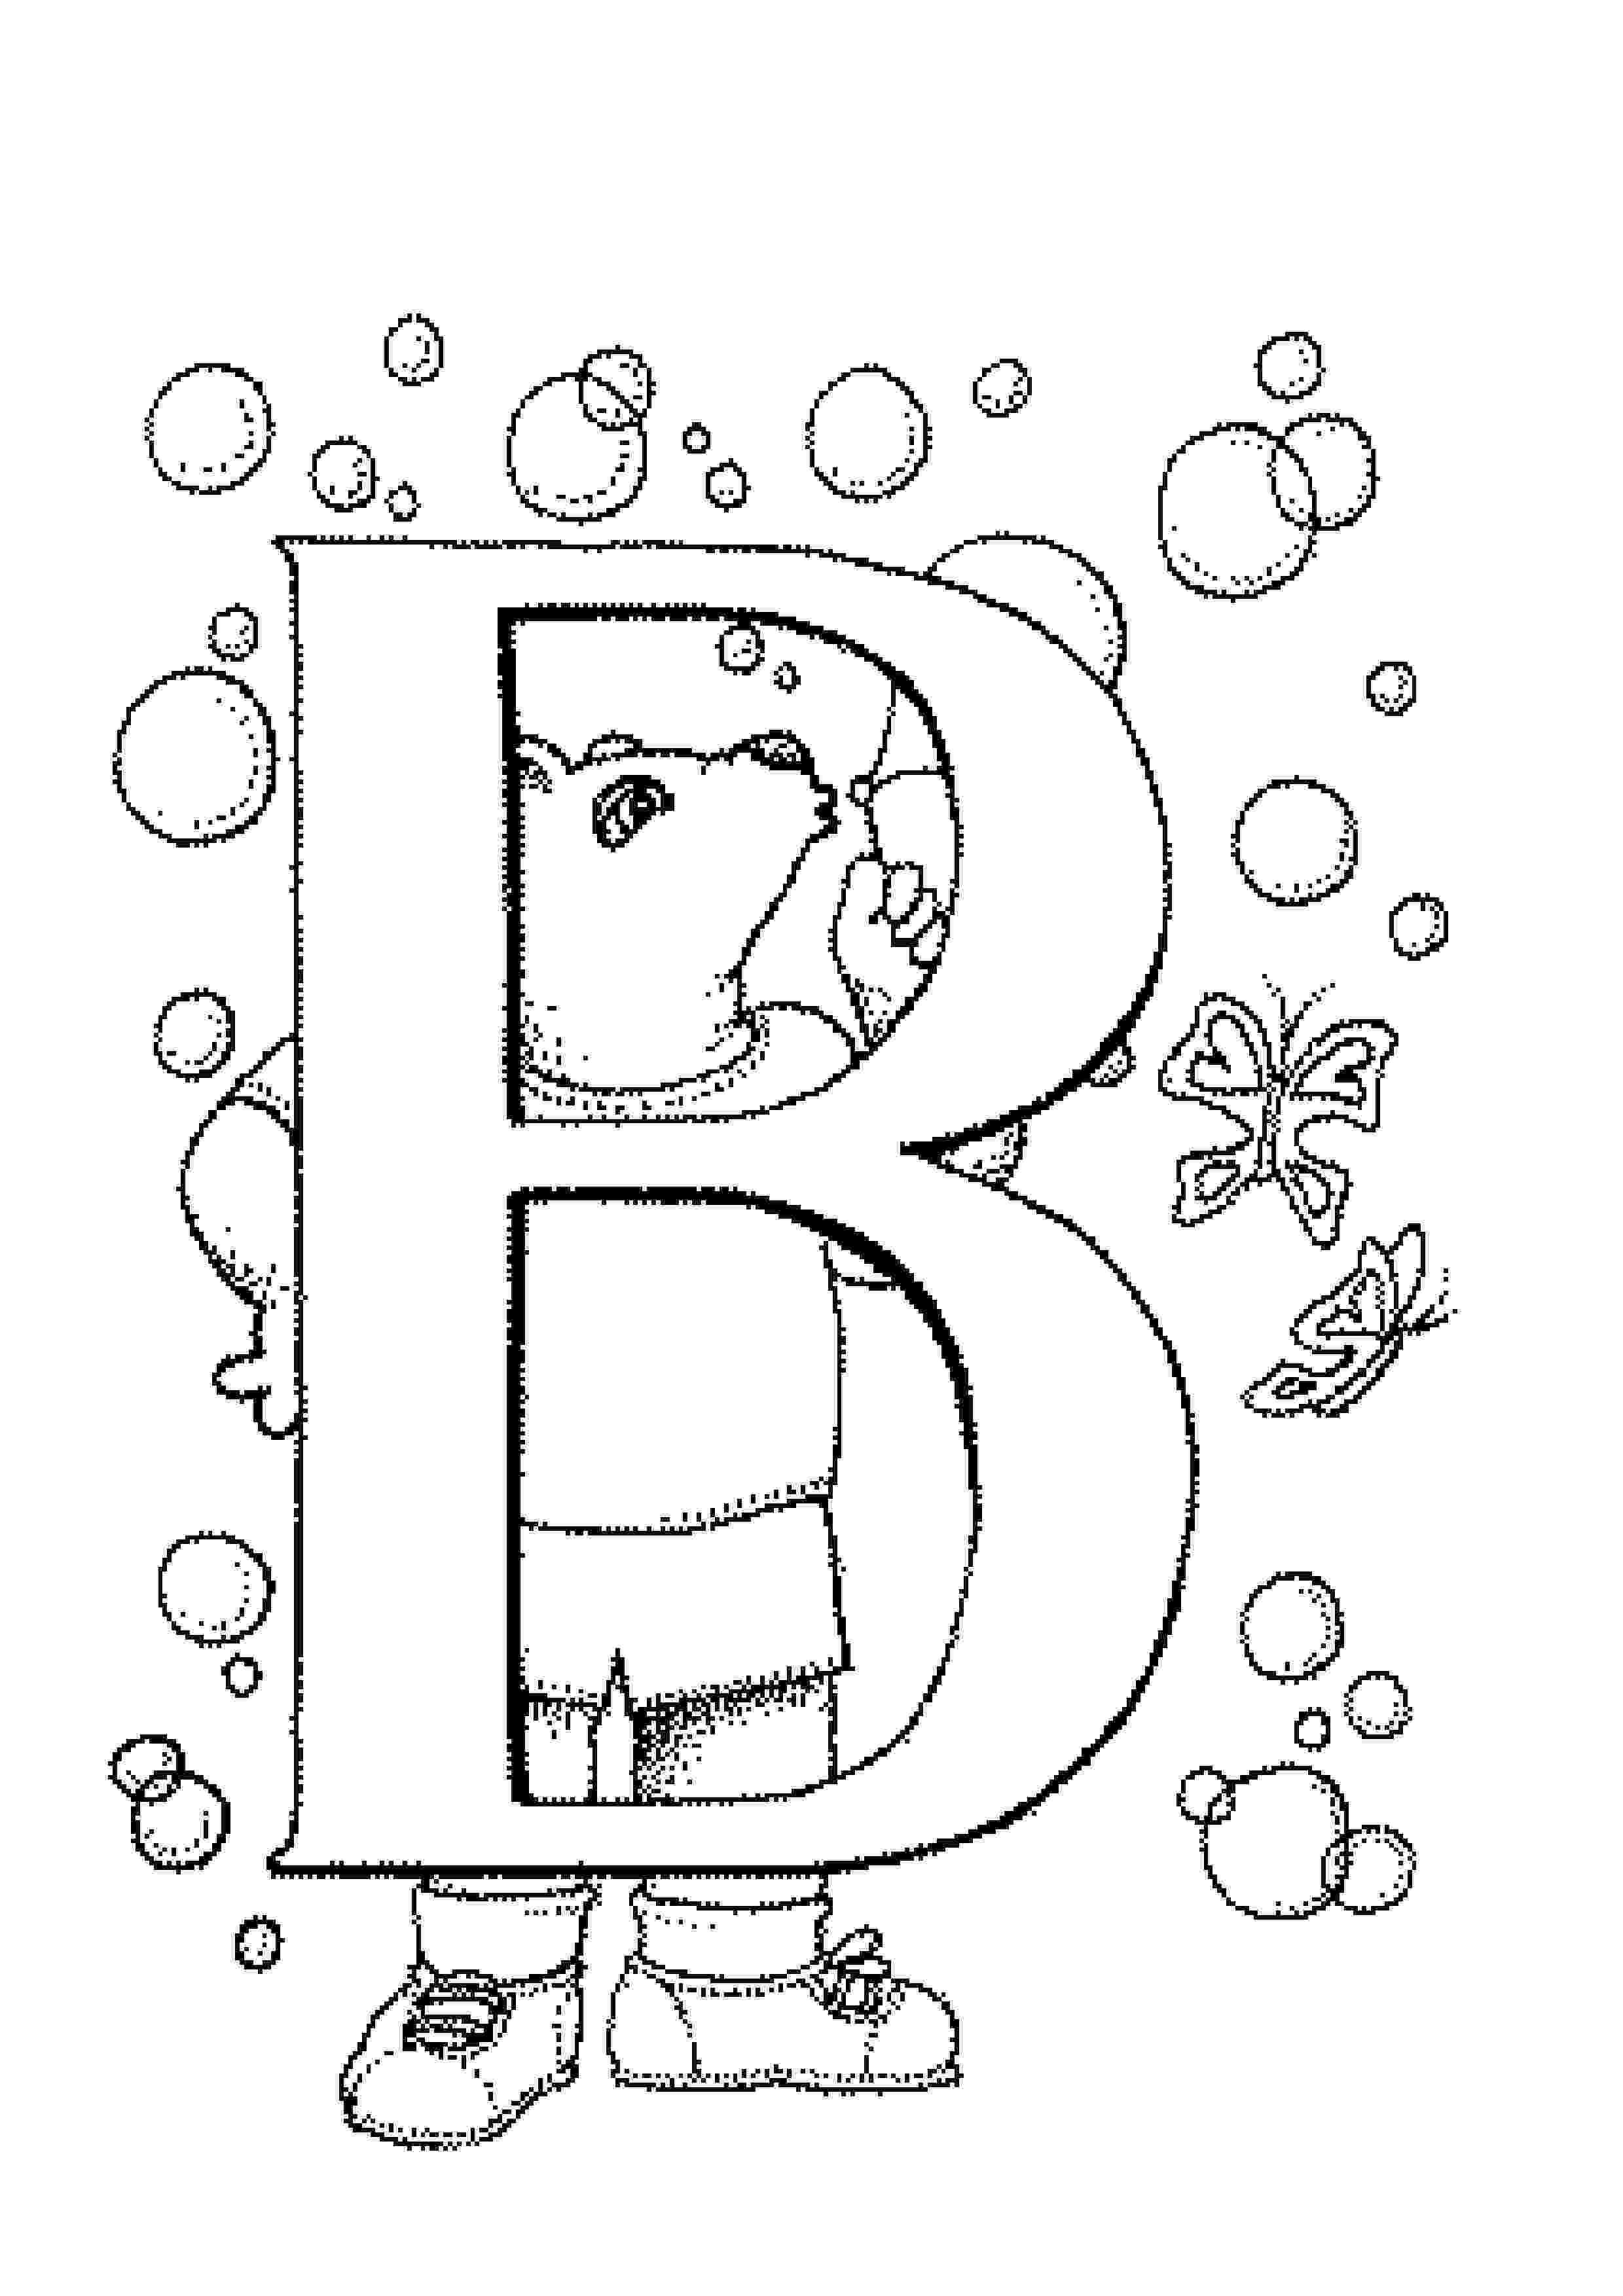 abc coloring book download animal alphabet q coloring page stock vector abc download book coloring